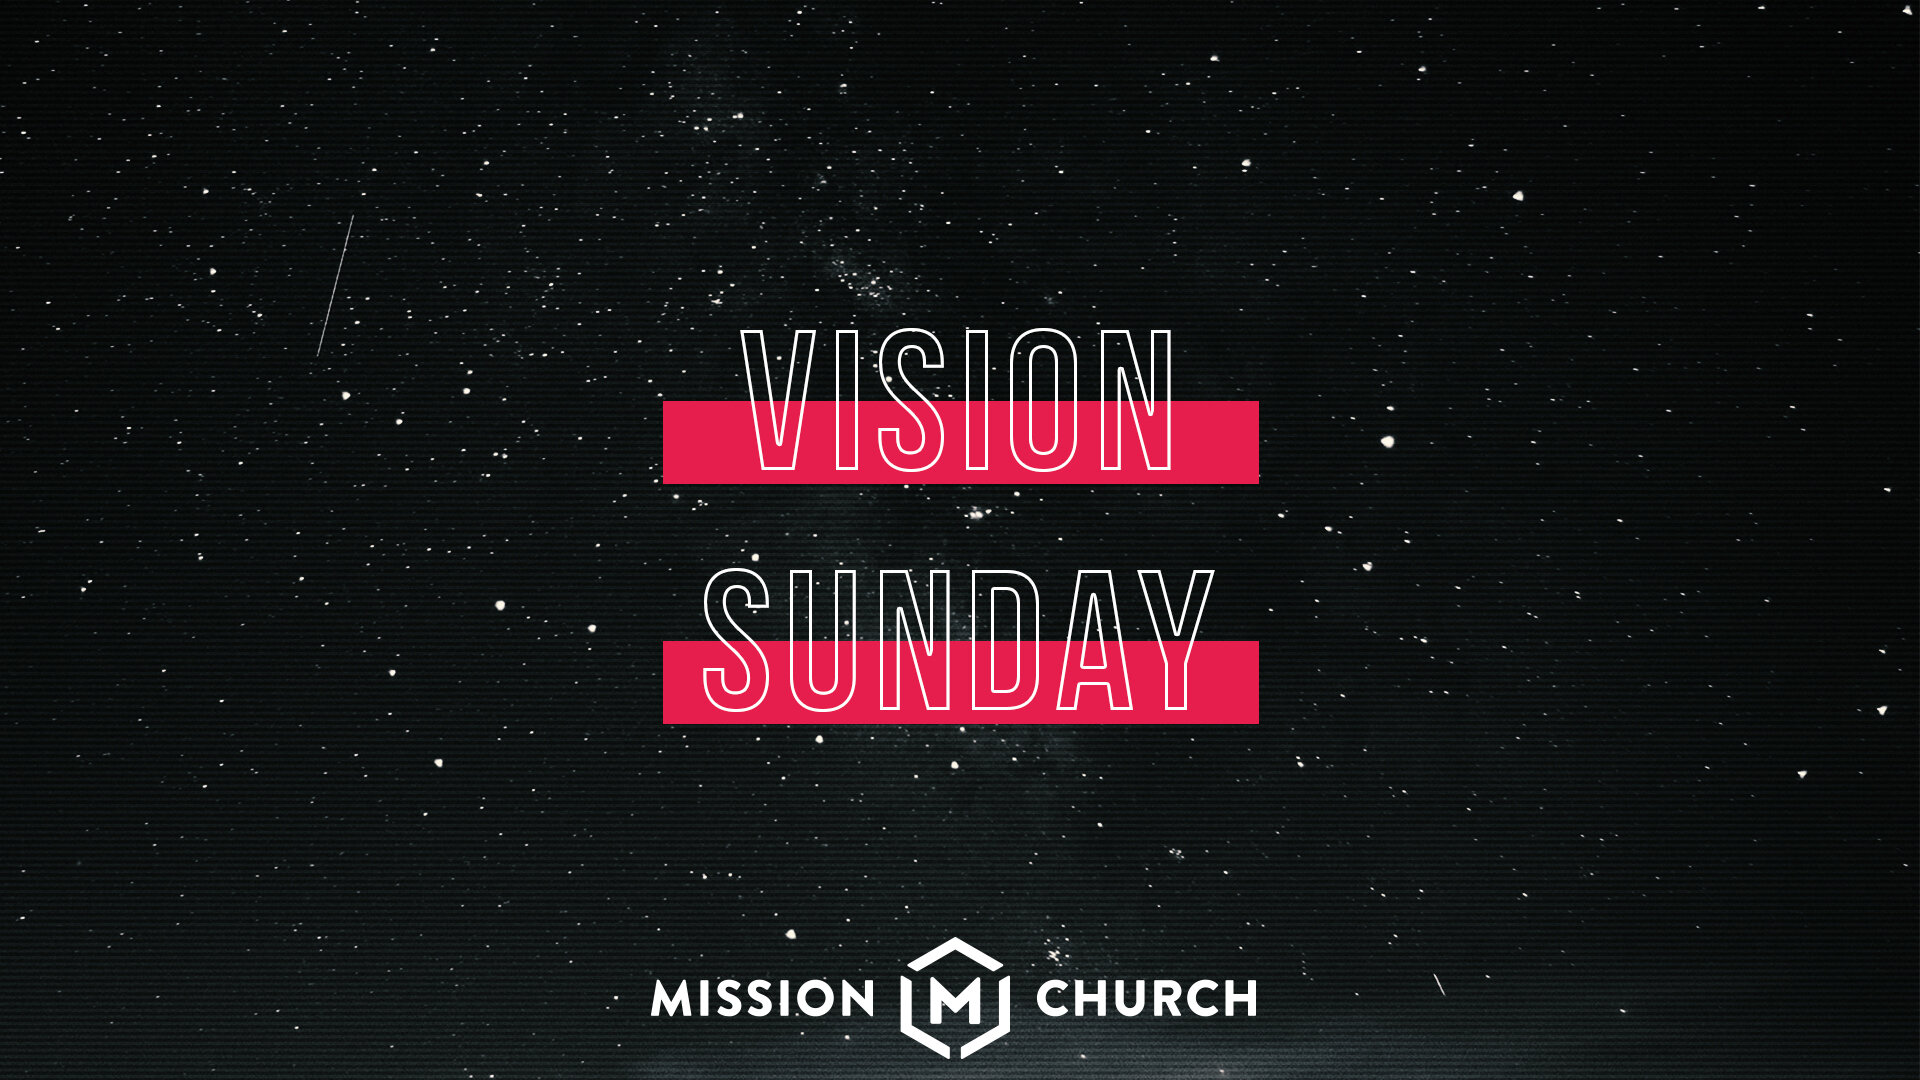 Vision_Sunday_Fall _2019_Title.jpg